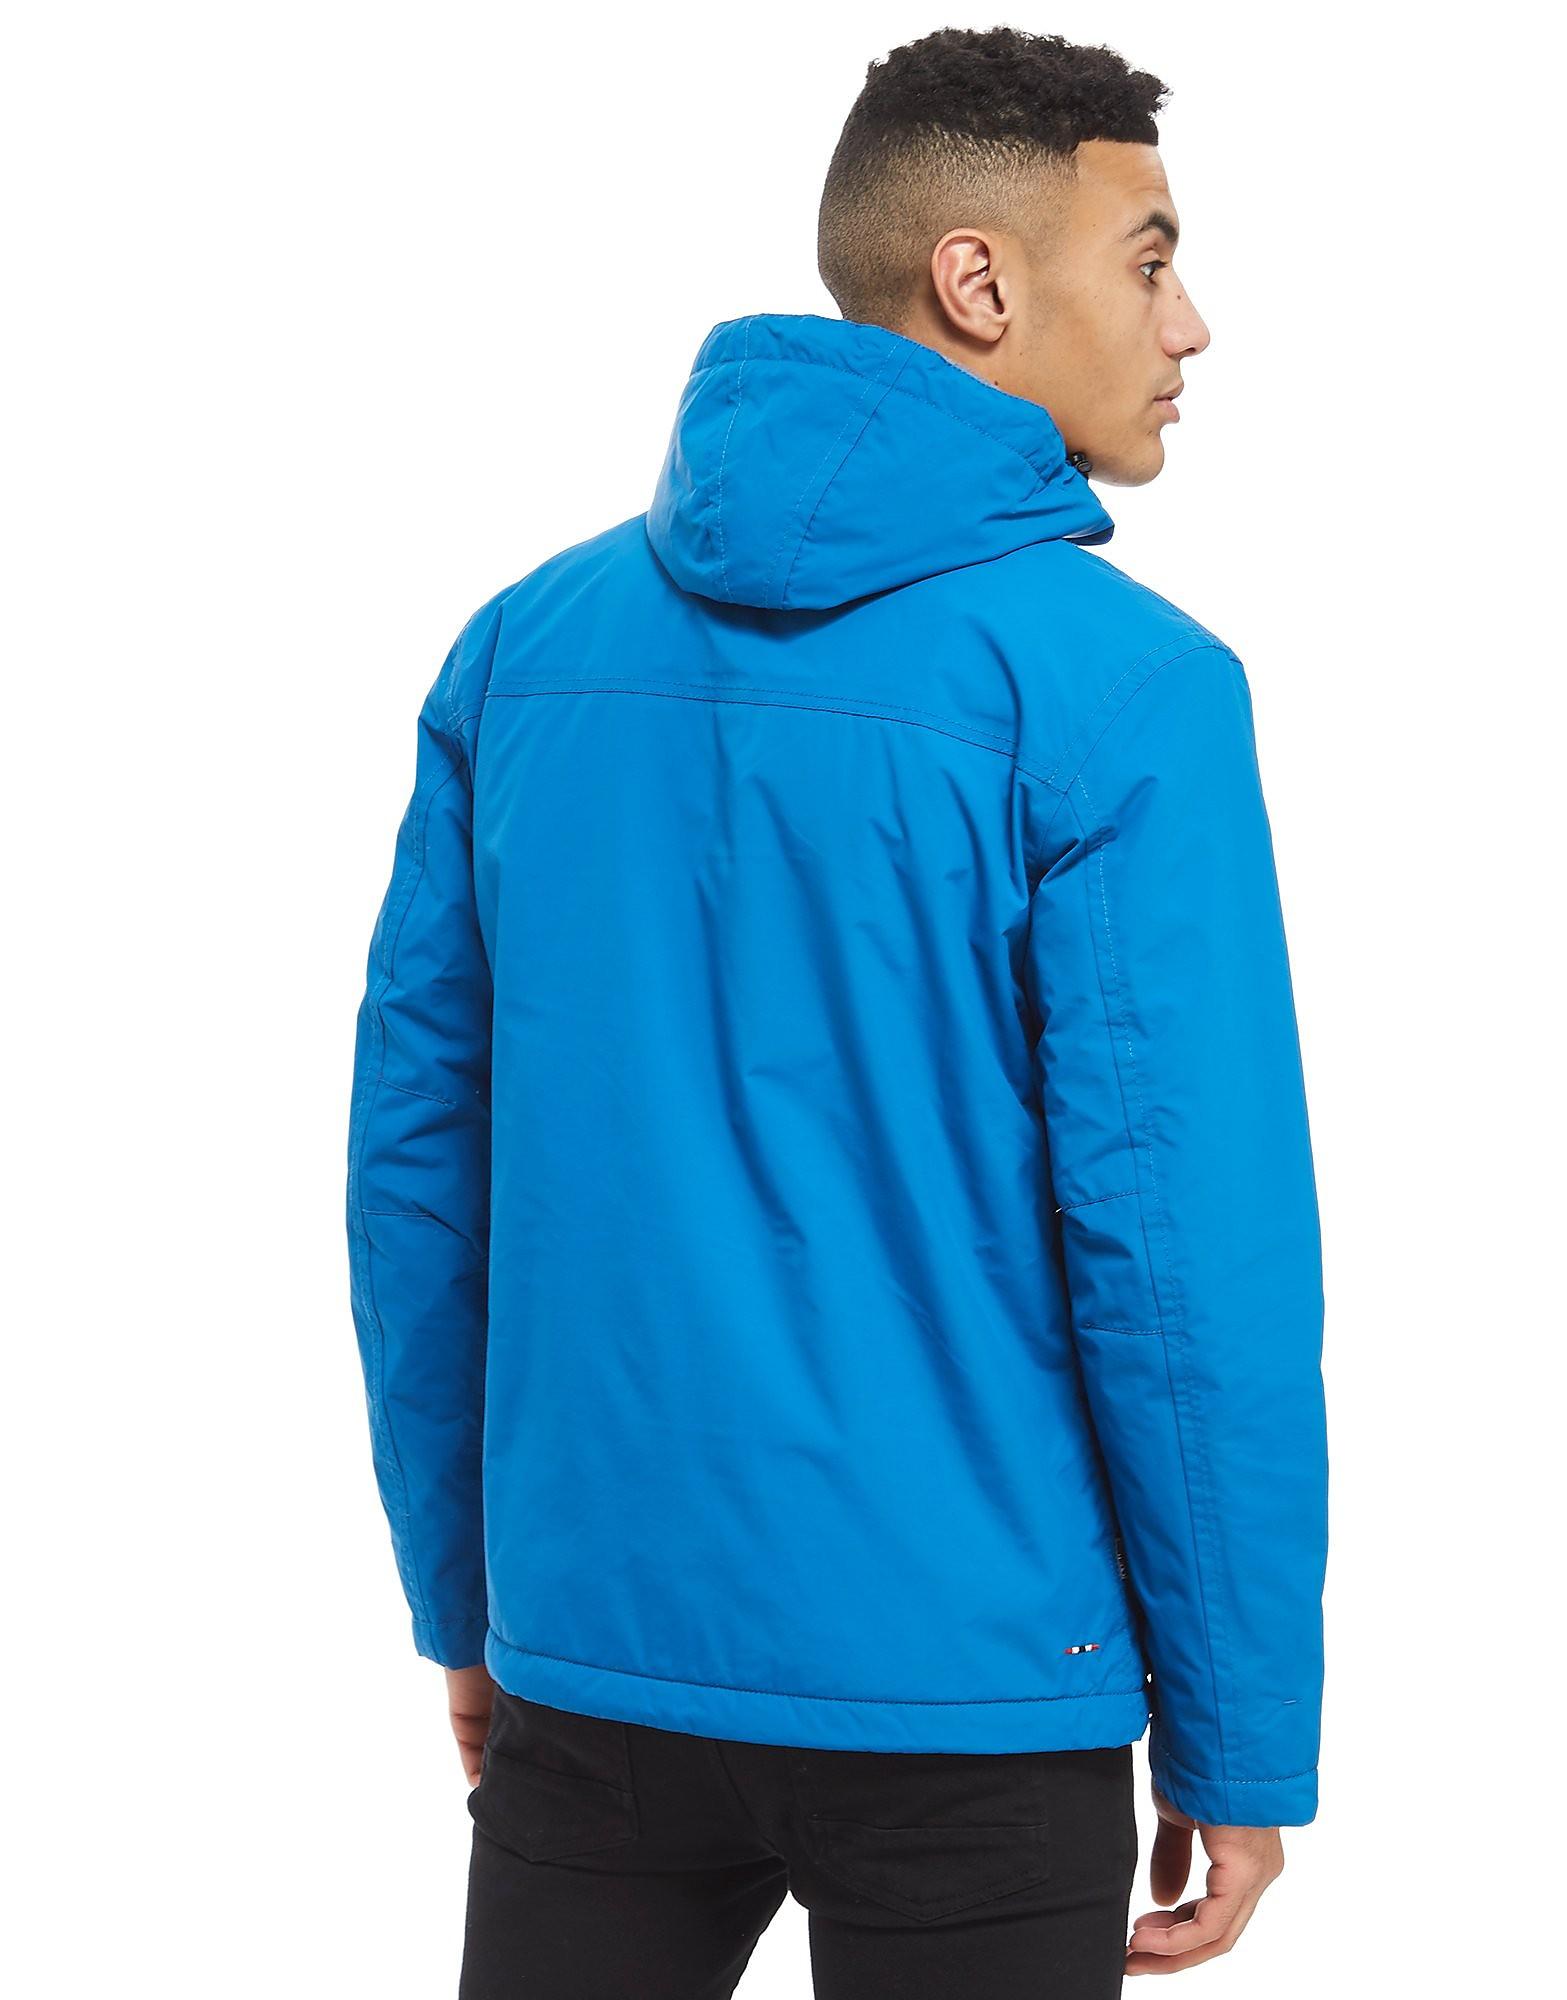 Napapijri Rainforest Winter Padded Quarter Zip Jacket